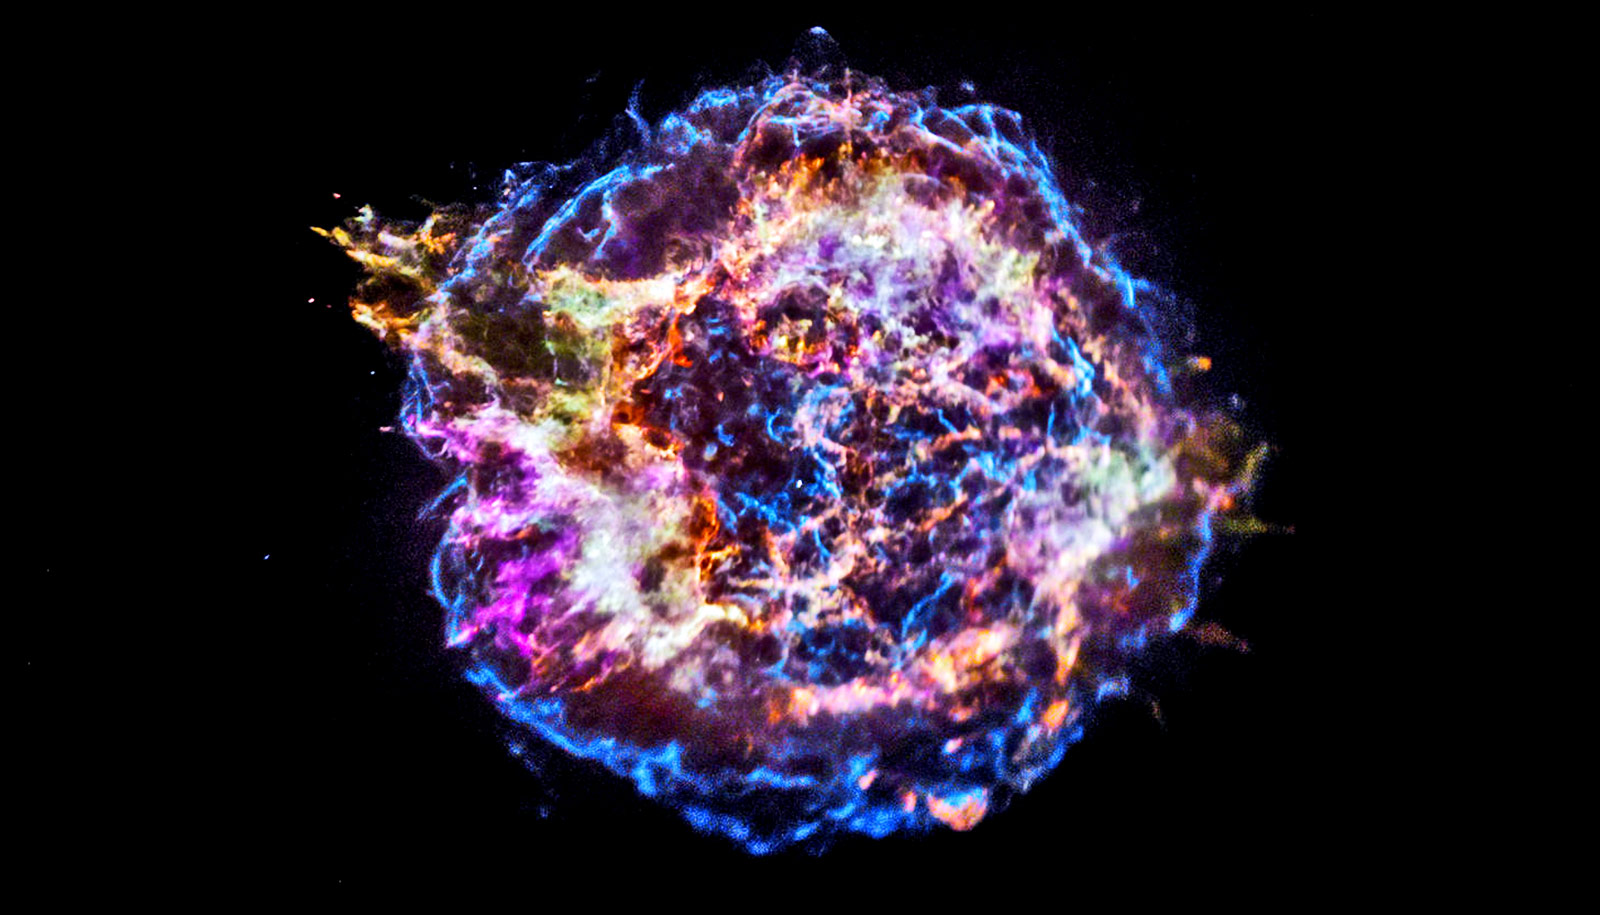 Supernova finding blows up an elemental origin theory - Futurity